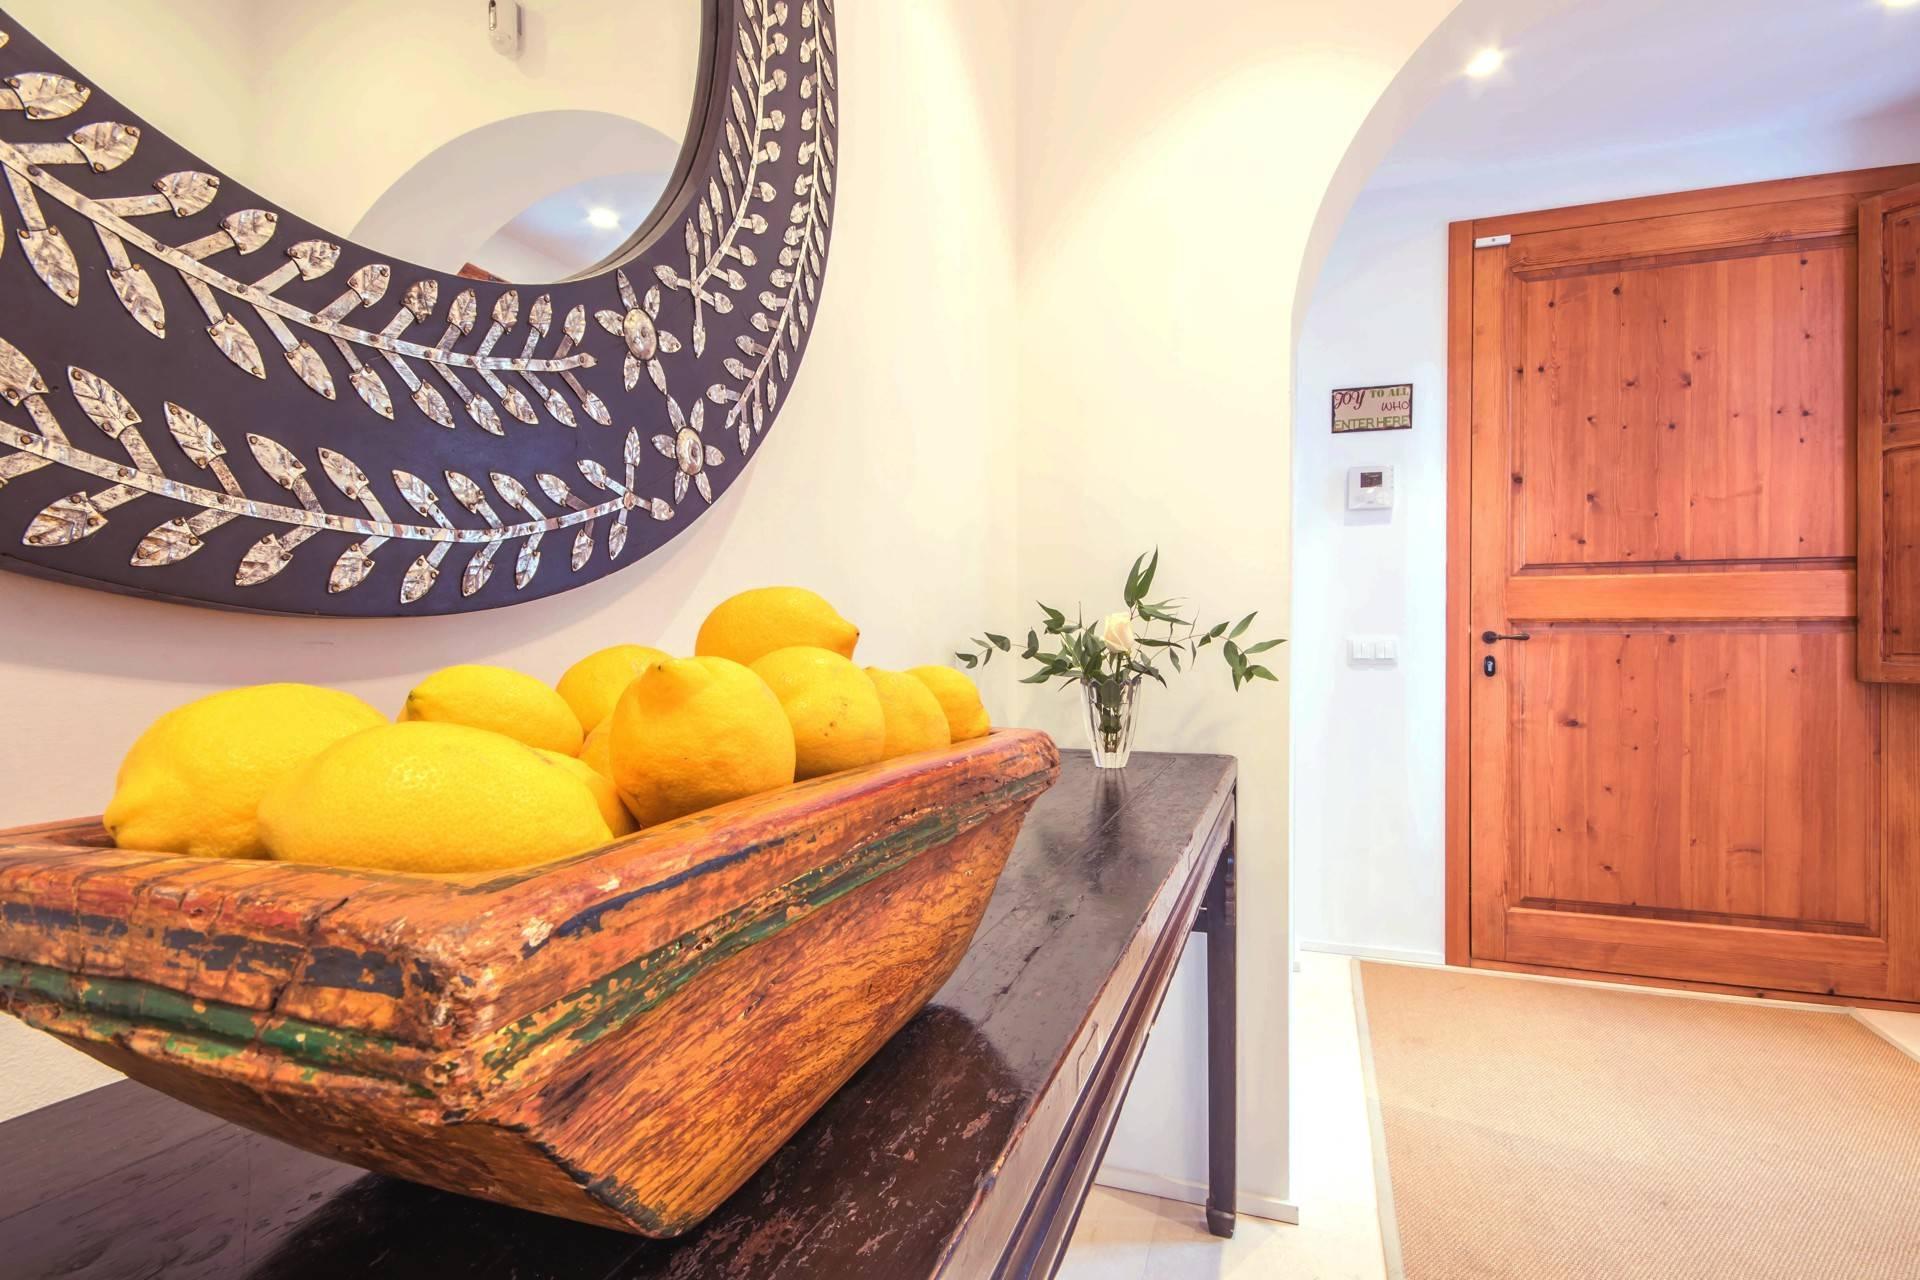 01-257 Luxus Ferienhaus Mallorca Südwesten Bild 5